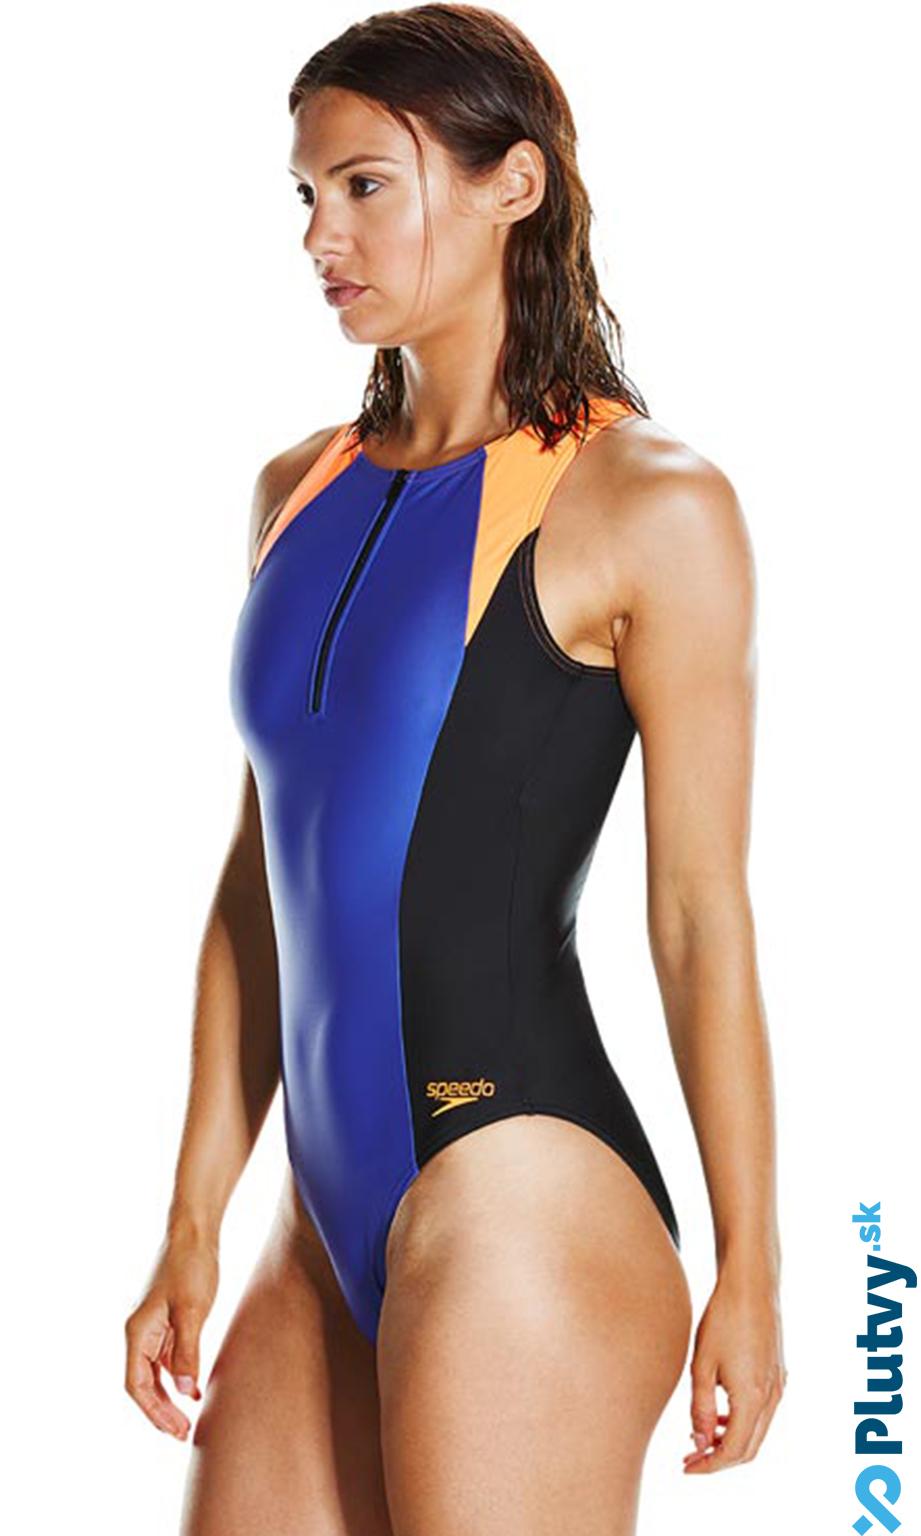 damske-sportove-jednodielne-plavky-speedo-hydrasuit-plutvy_sk